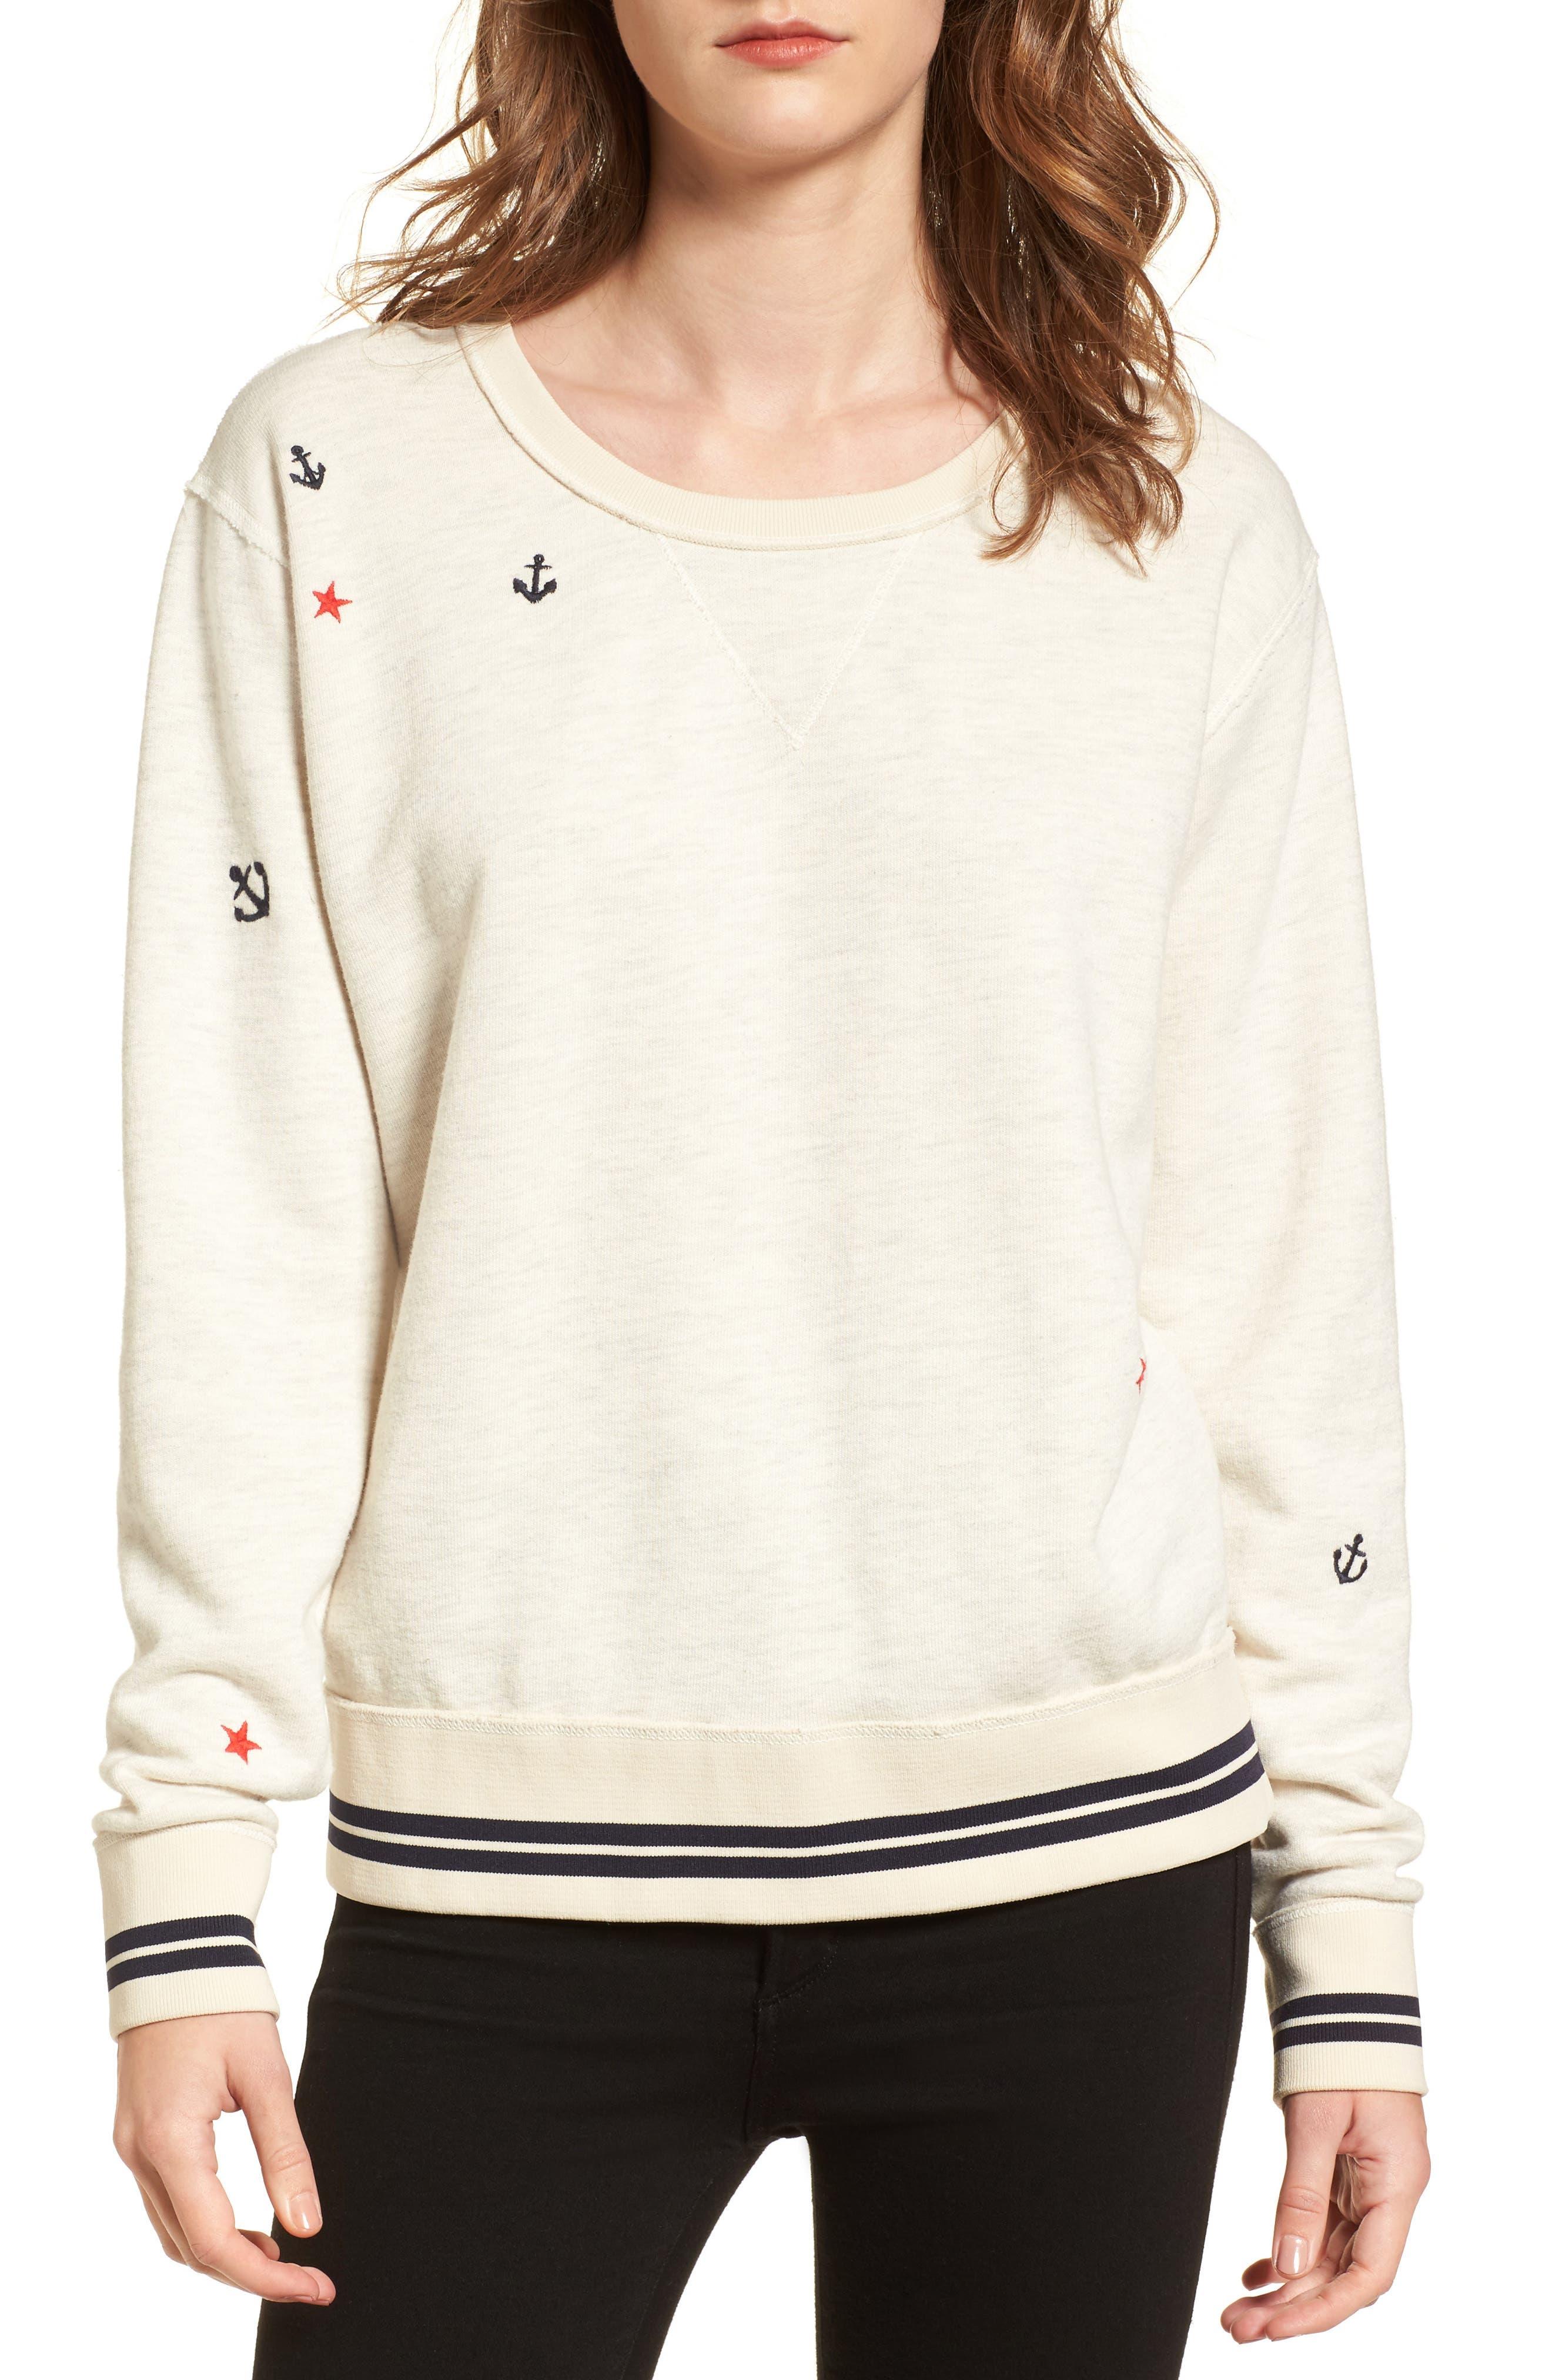 Scotch & Soda Nautical Sweatshirt